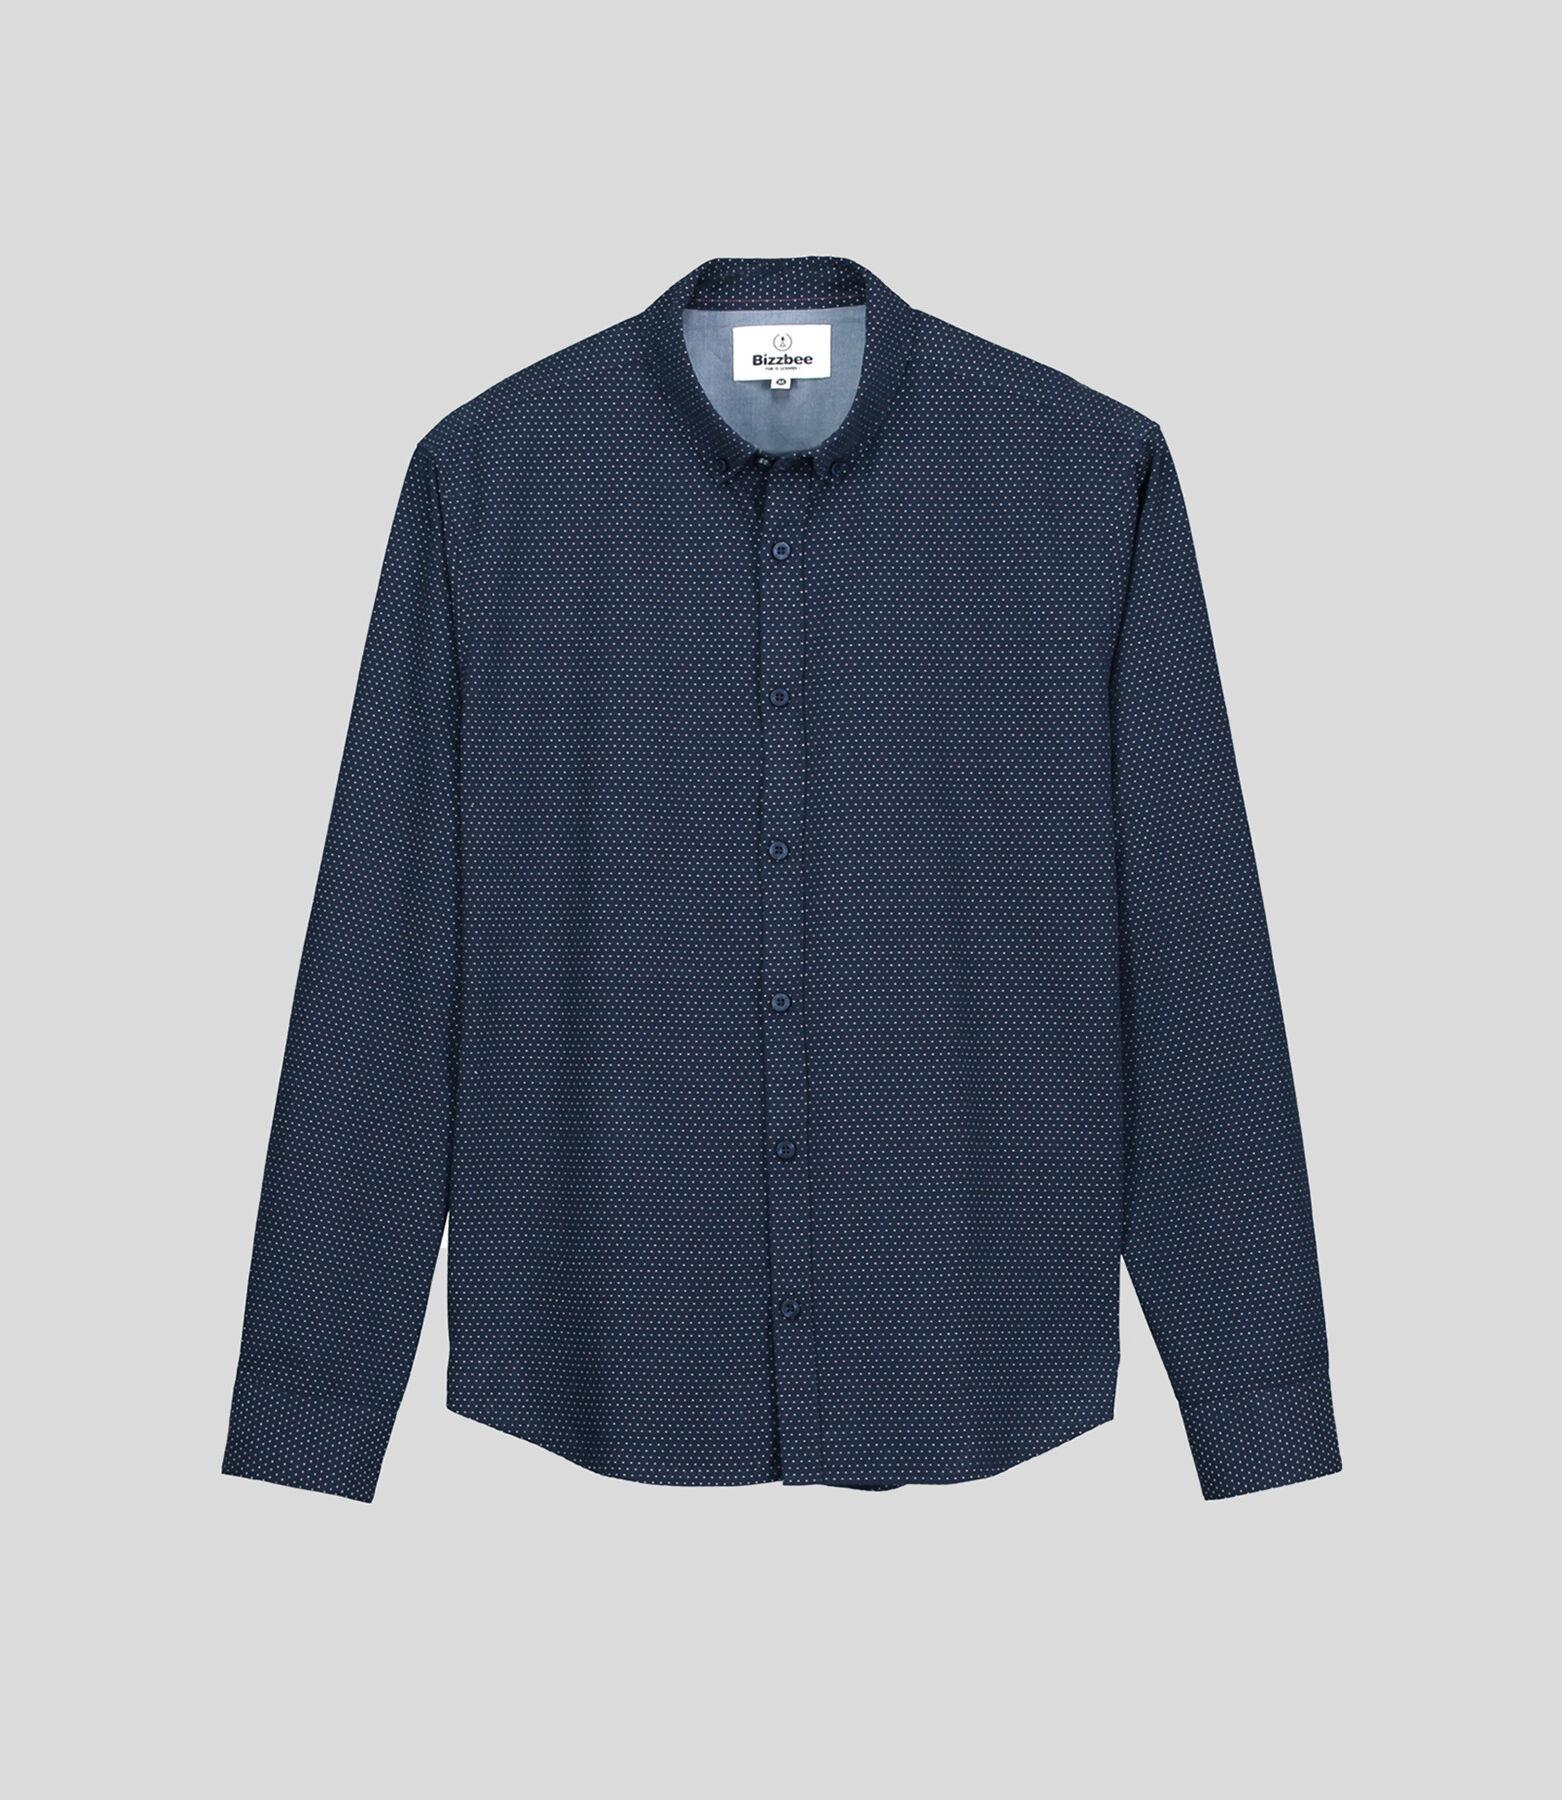 Chemise Sportswear Bleu Marine Clair